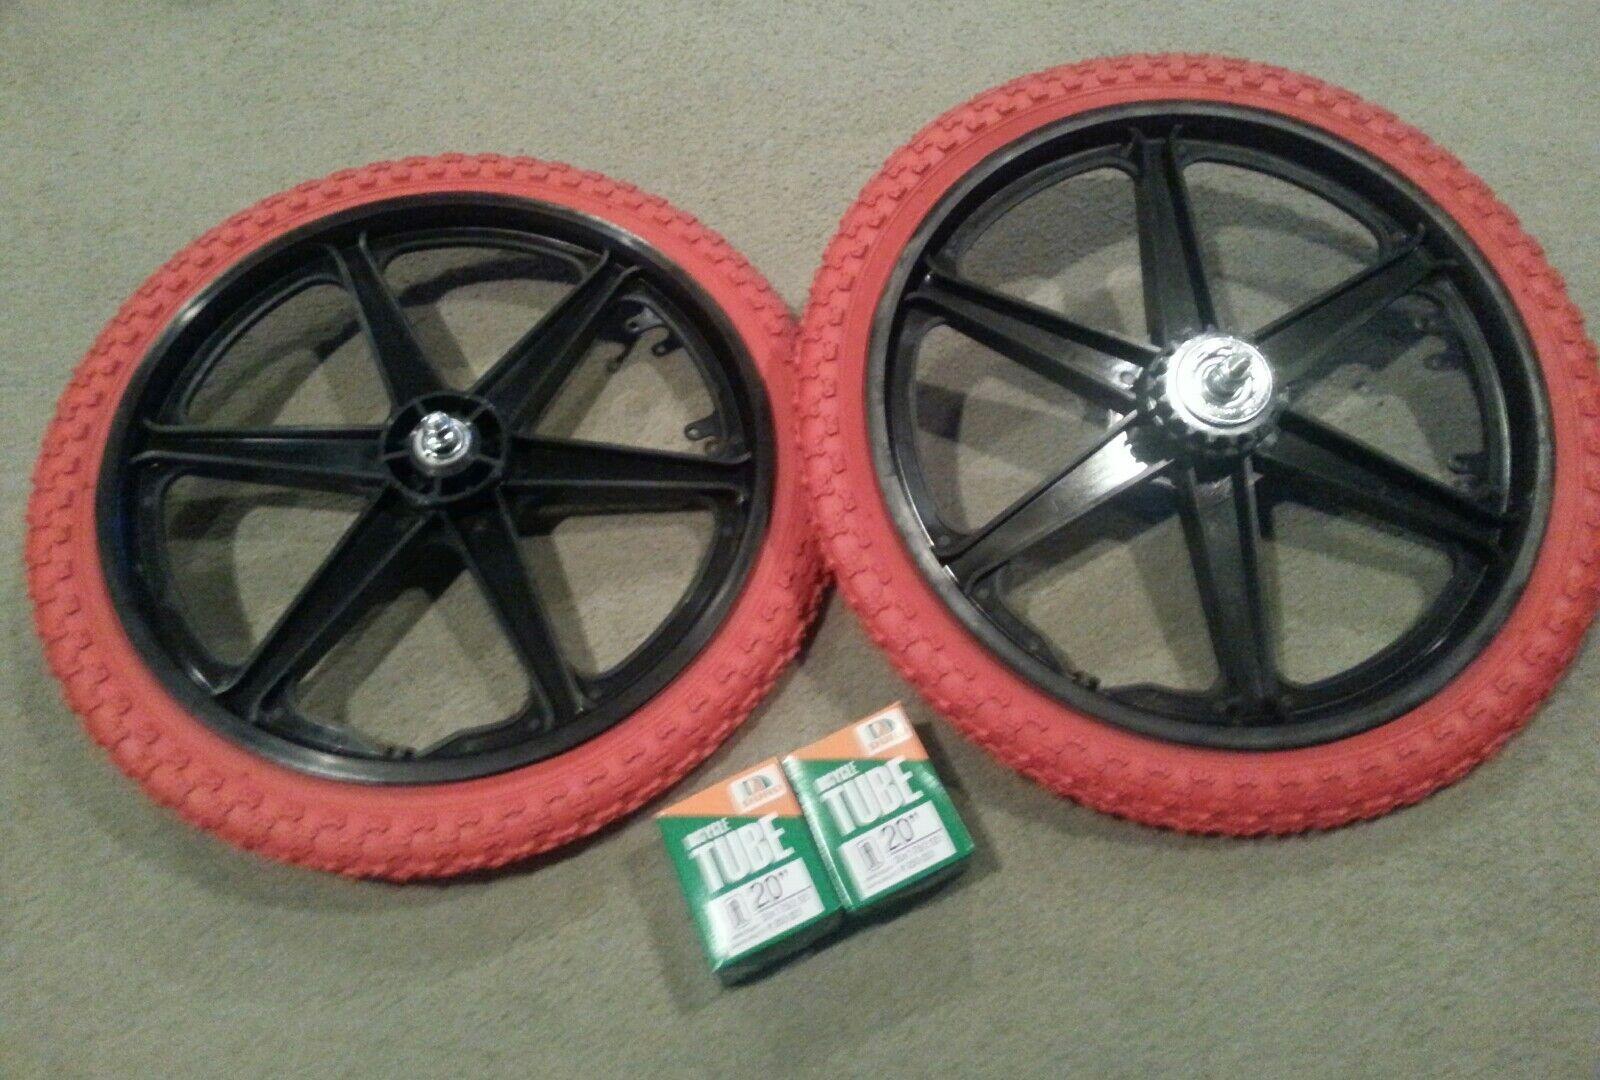 Nuevo 20  MAG Ruedas de 6 radios Rojo Neumáticos Tubos Para Gt Dyno Haro Bmx Bicicletas